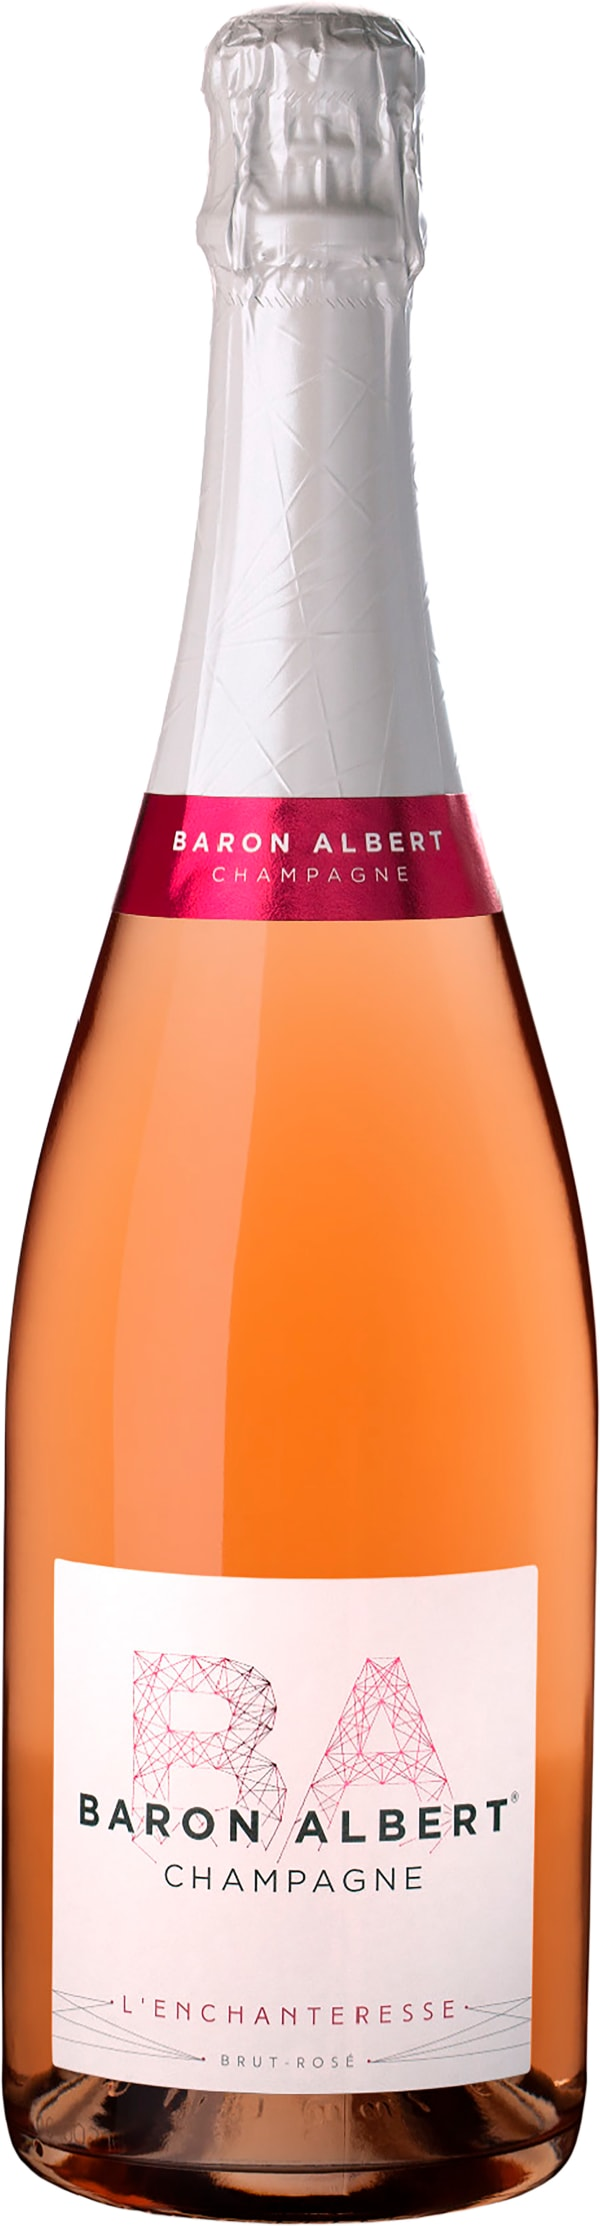 Baron-Albert L'Enchanteresse Rosé Champagne Brut